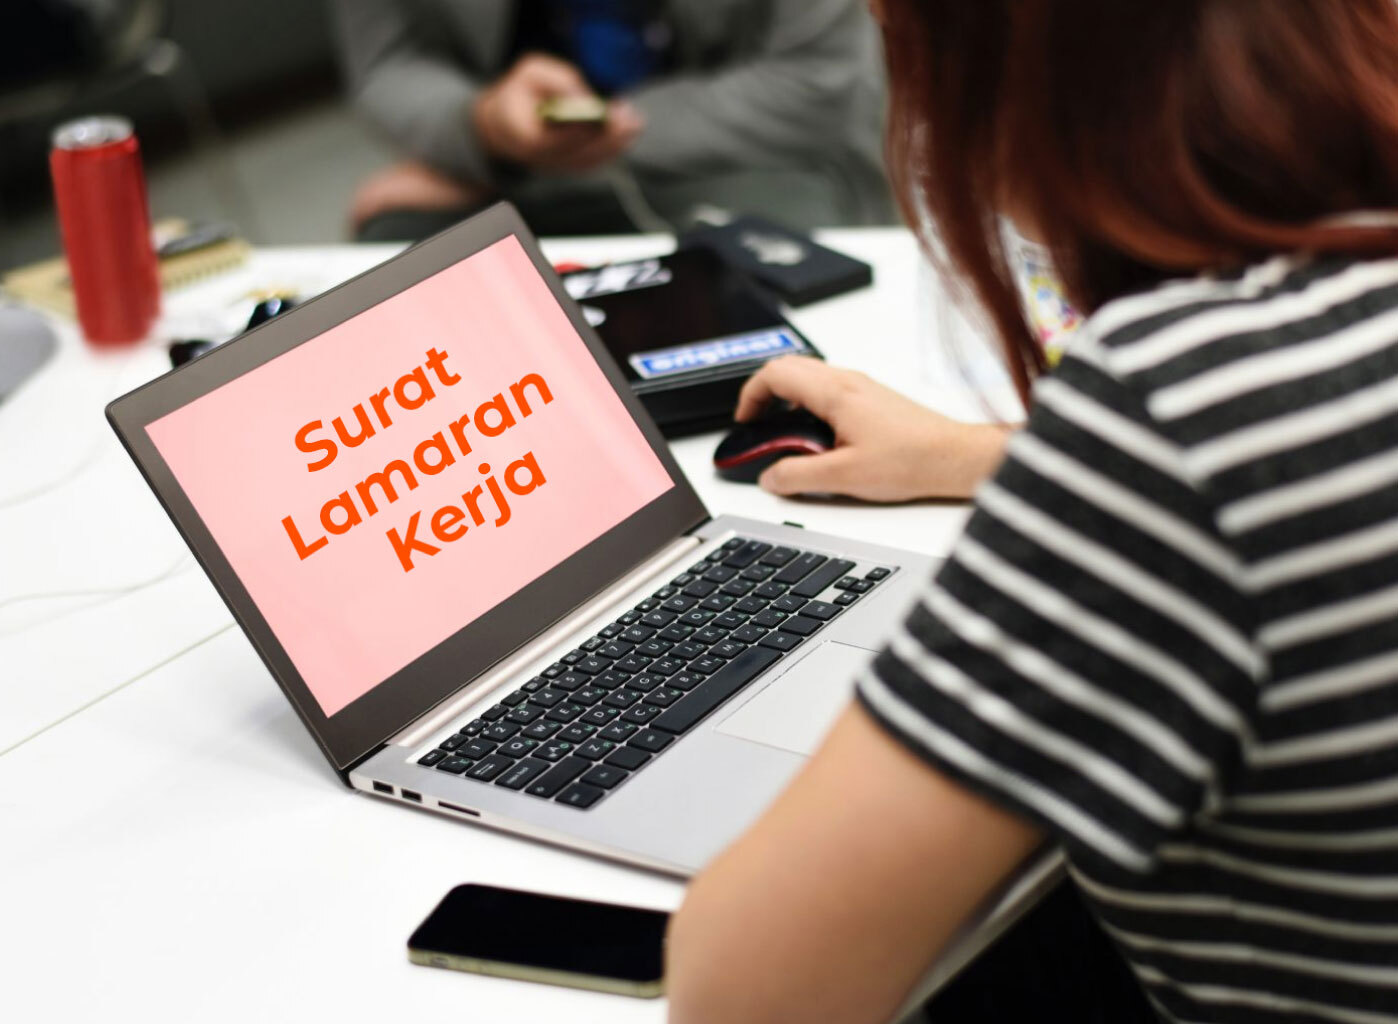 Contoh Surat Lamaran Kerja Umum untuk Fresh Graduate